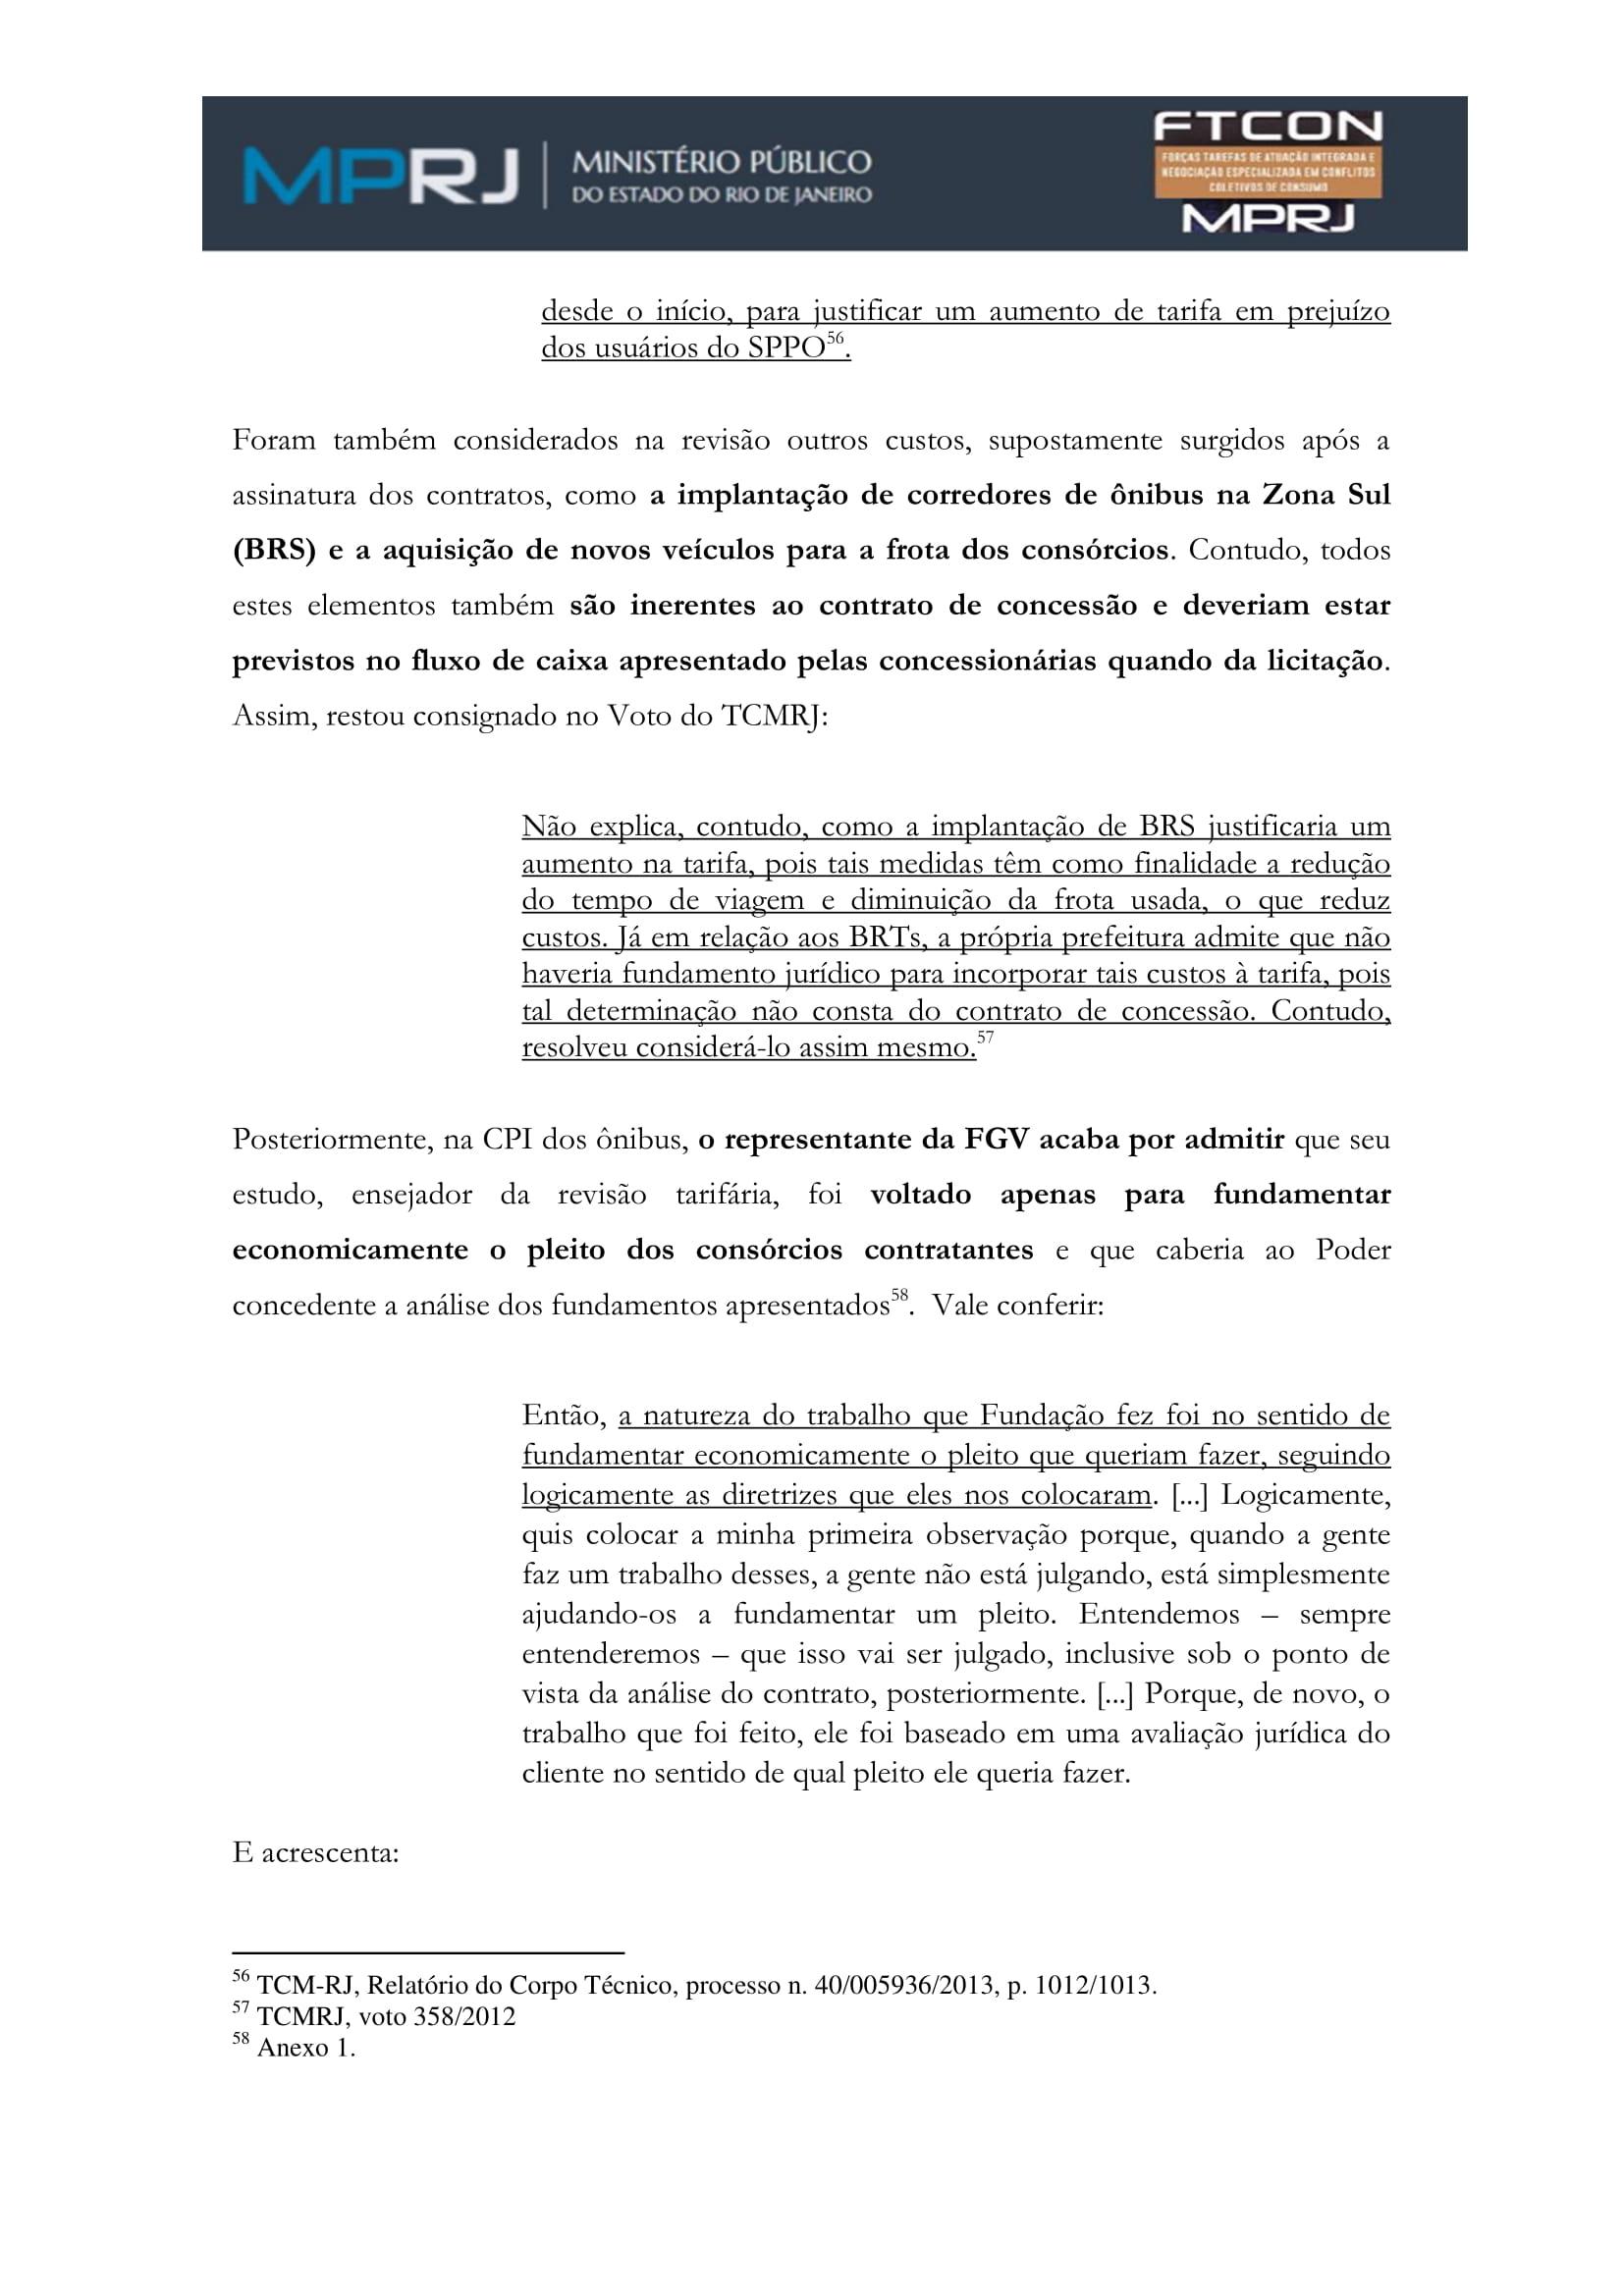 acp_caducidade_onibus_dr_rt-072